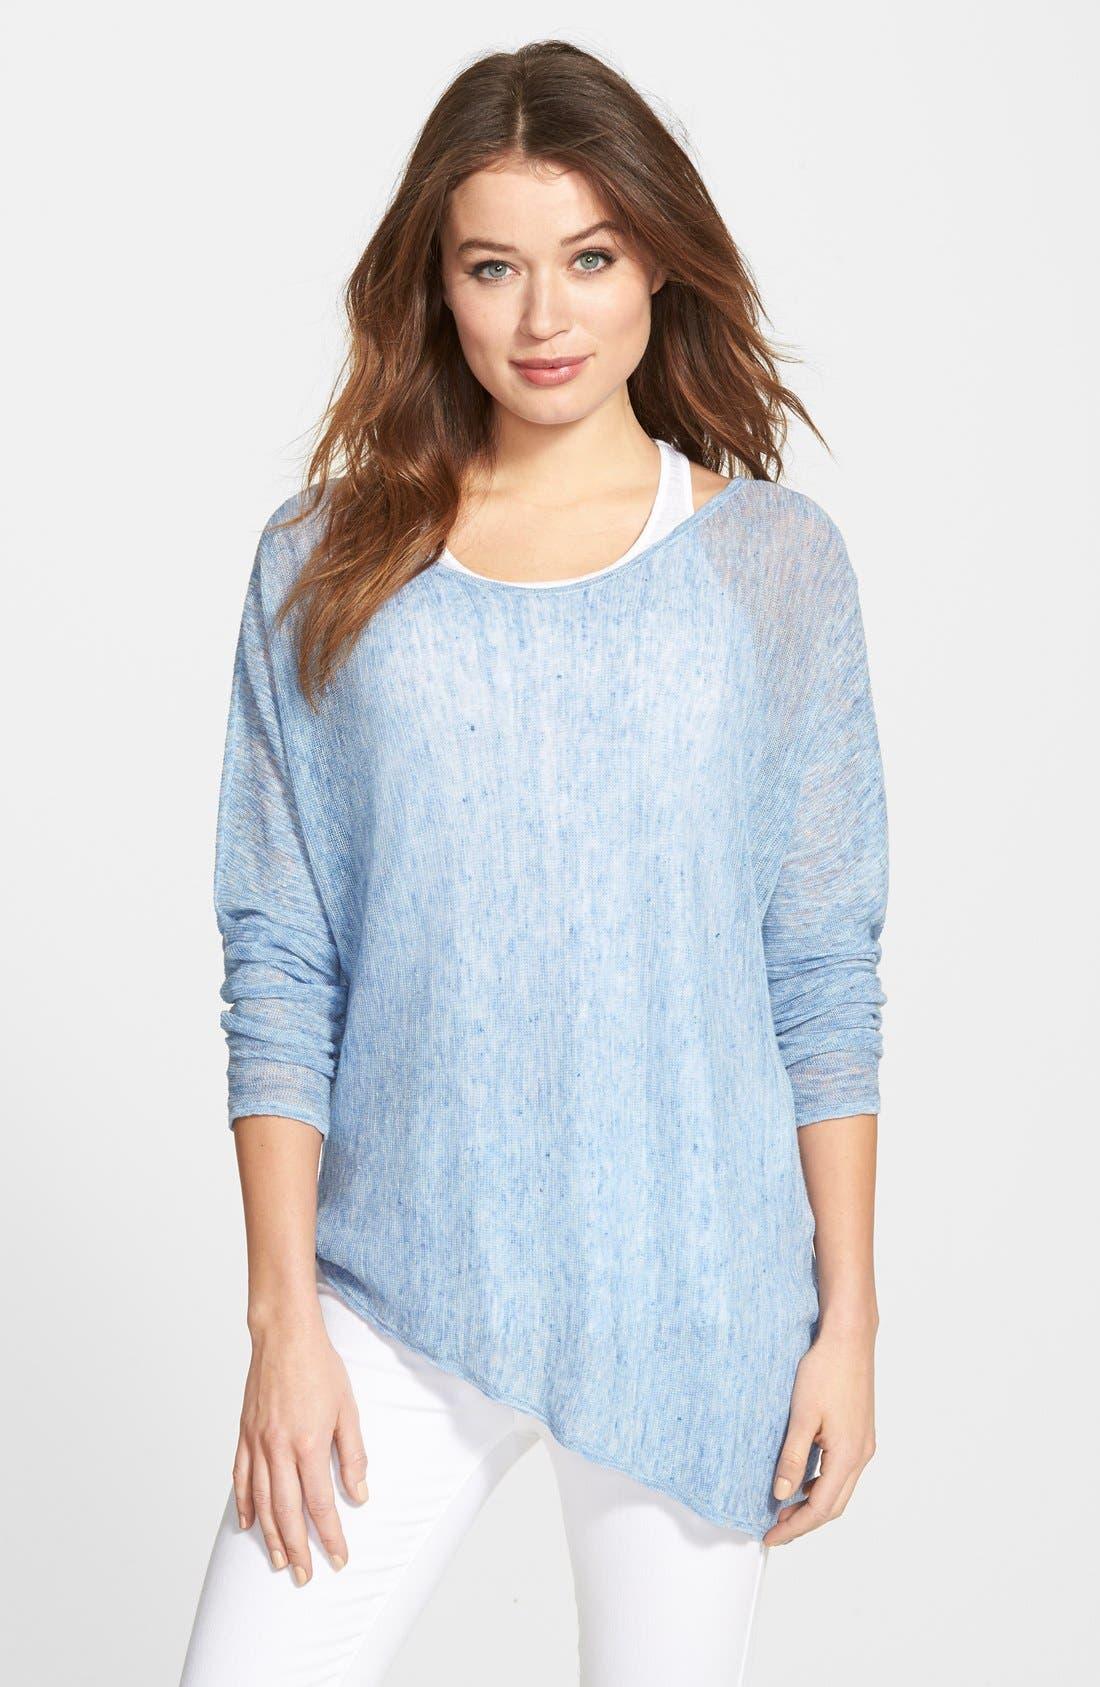 Alternate Image 1 Selected - Eileen Fisher Linen Asymmetrical Top (Regular & Petite) (Online Only)